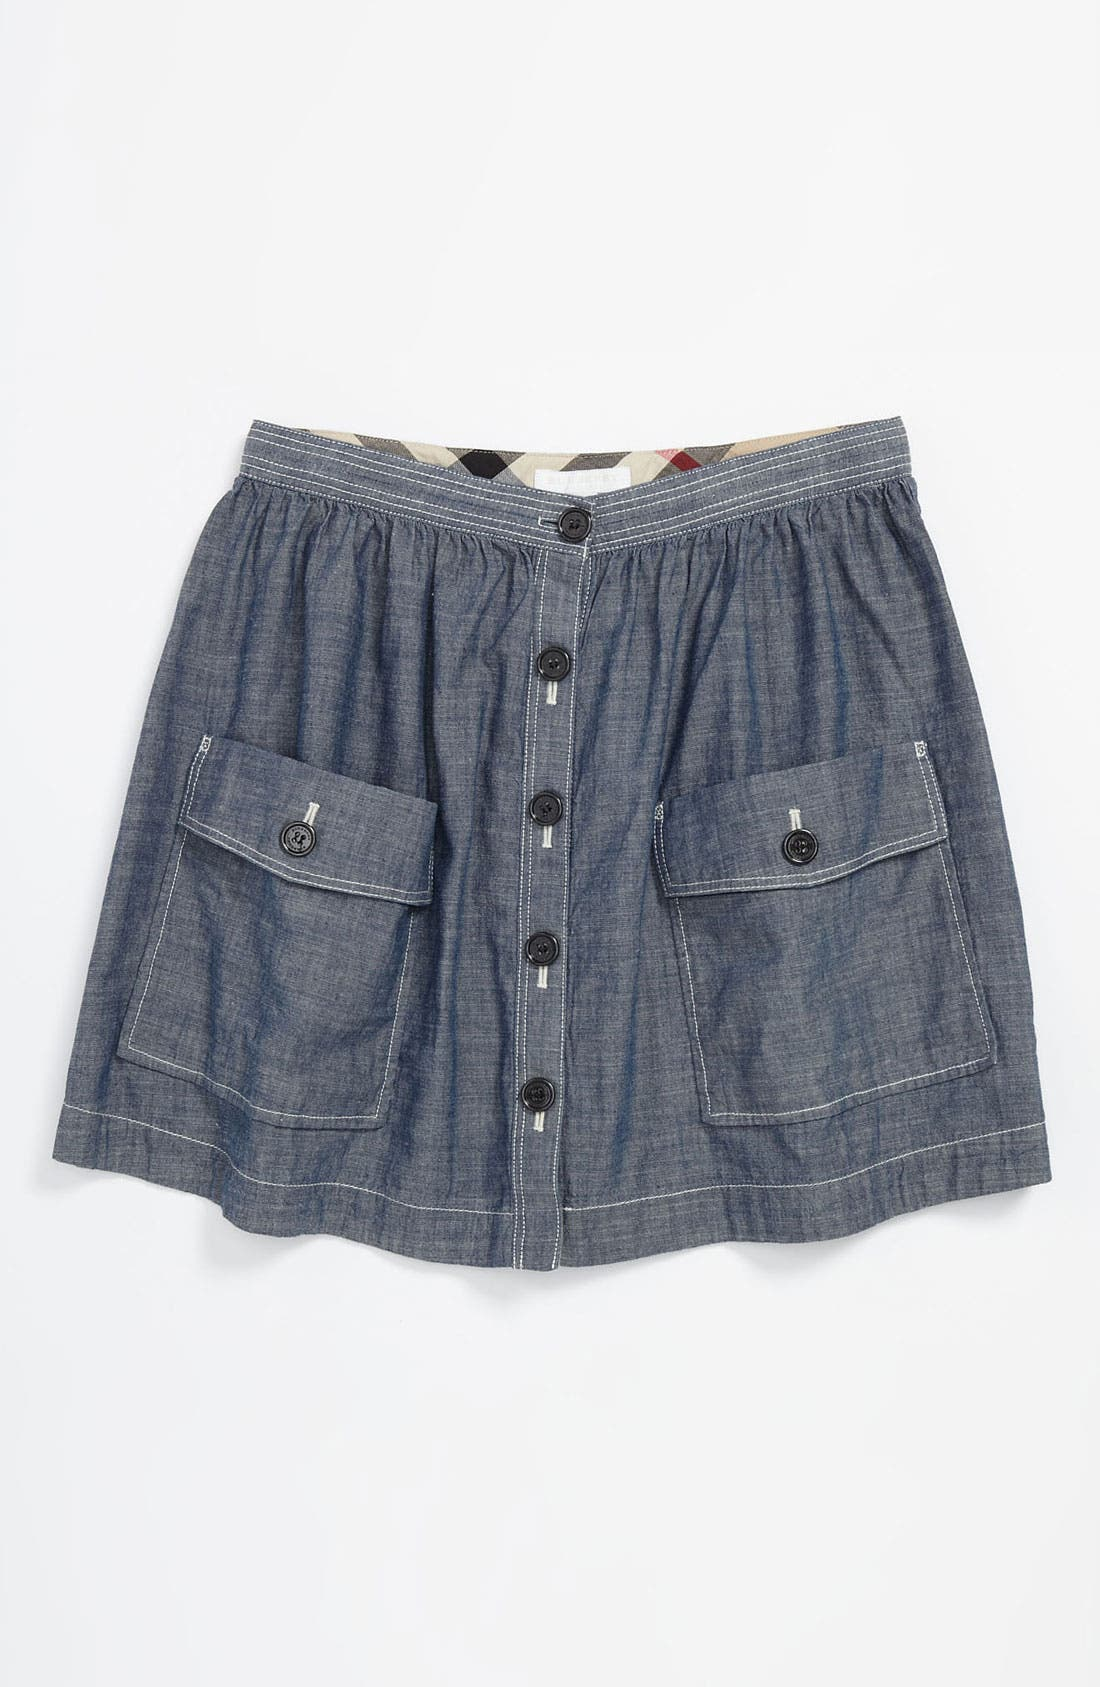 Alternate Image 1 Selected - Burberry 'Silvie' Button Front Chambray Skirt (Little Girls & Big Girls)